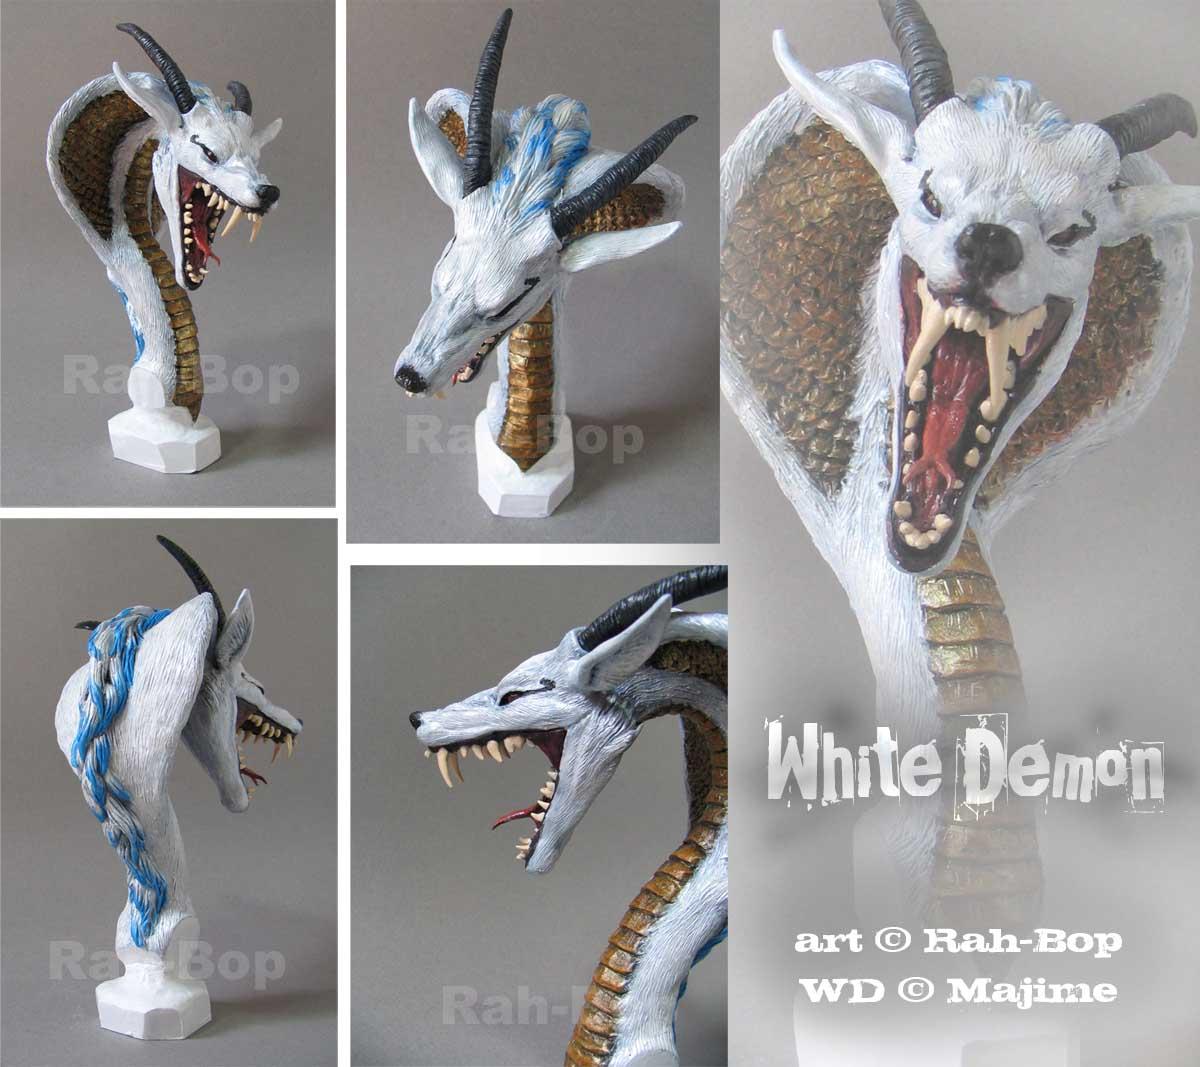 WhiteDemon bust by rah-bop